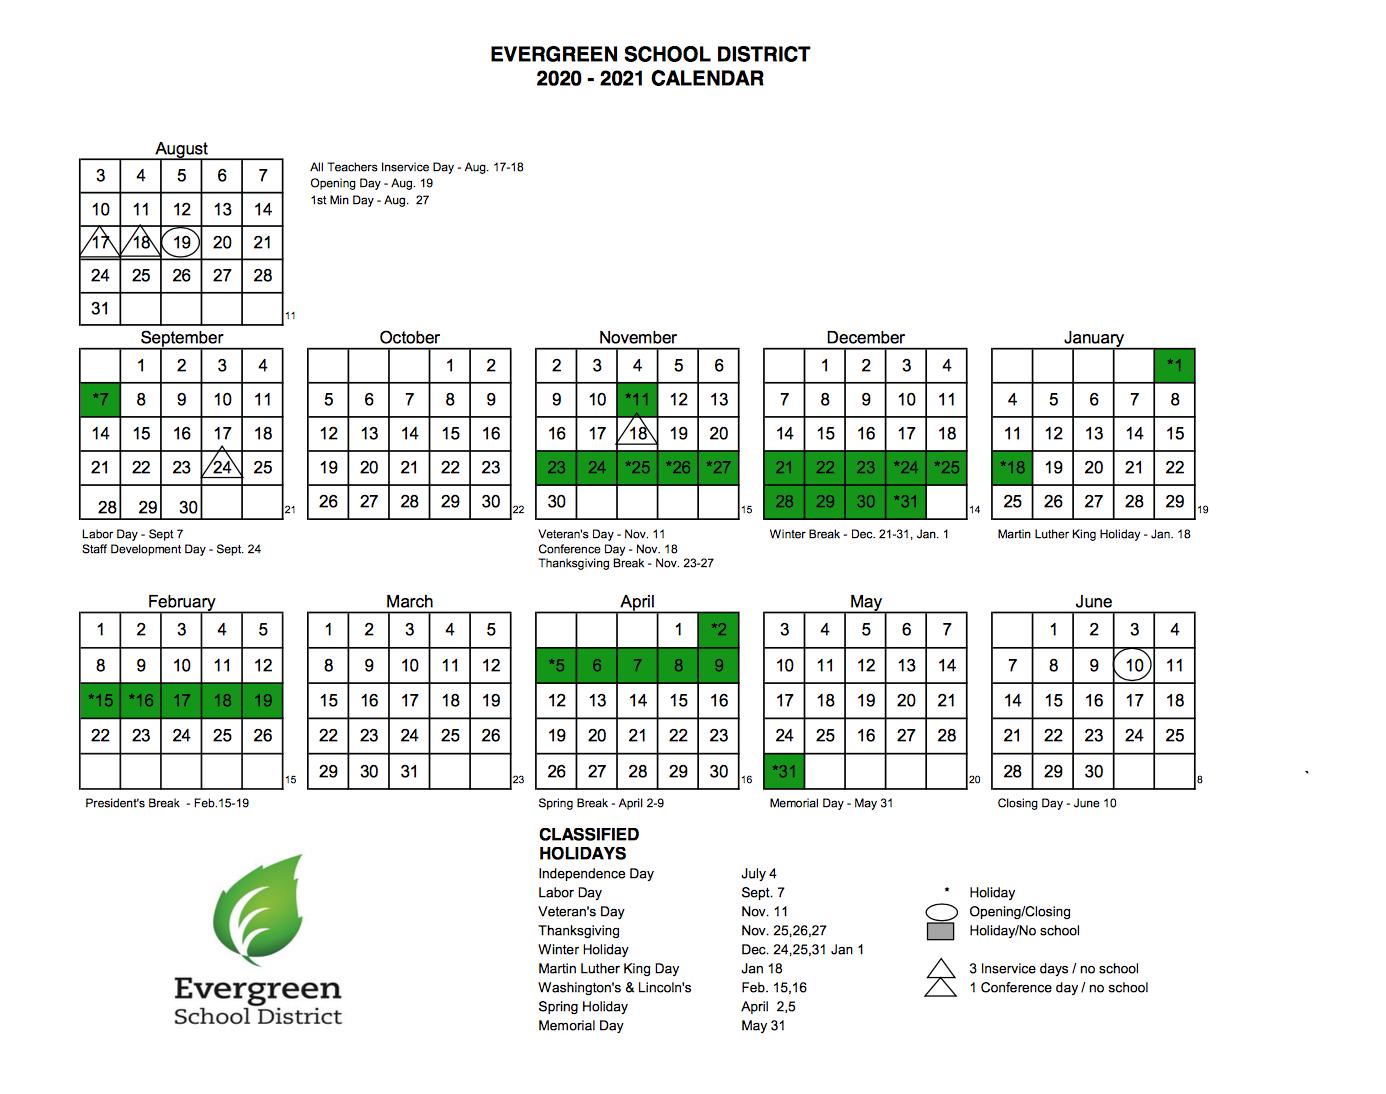 2021 Evergreen School Year